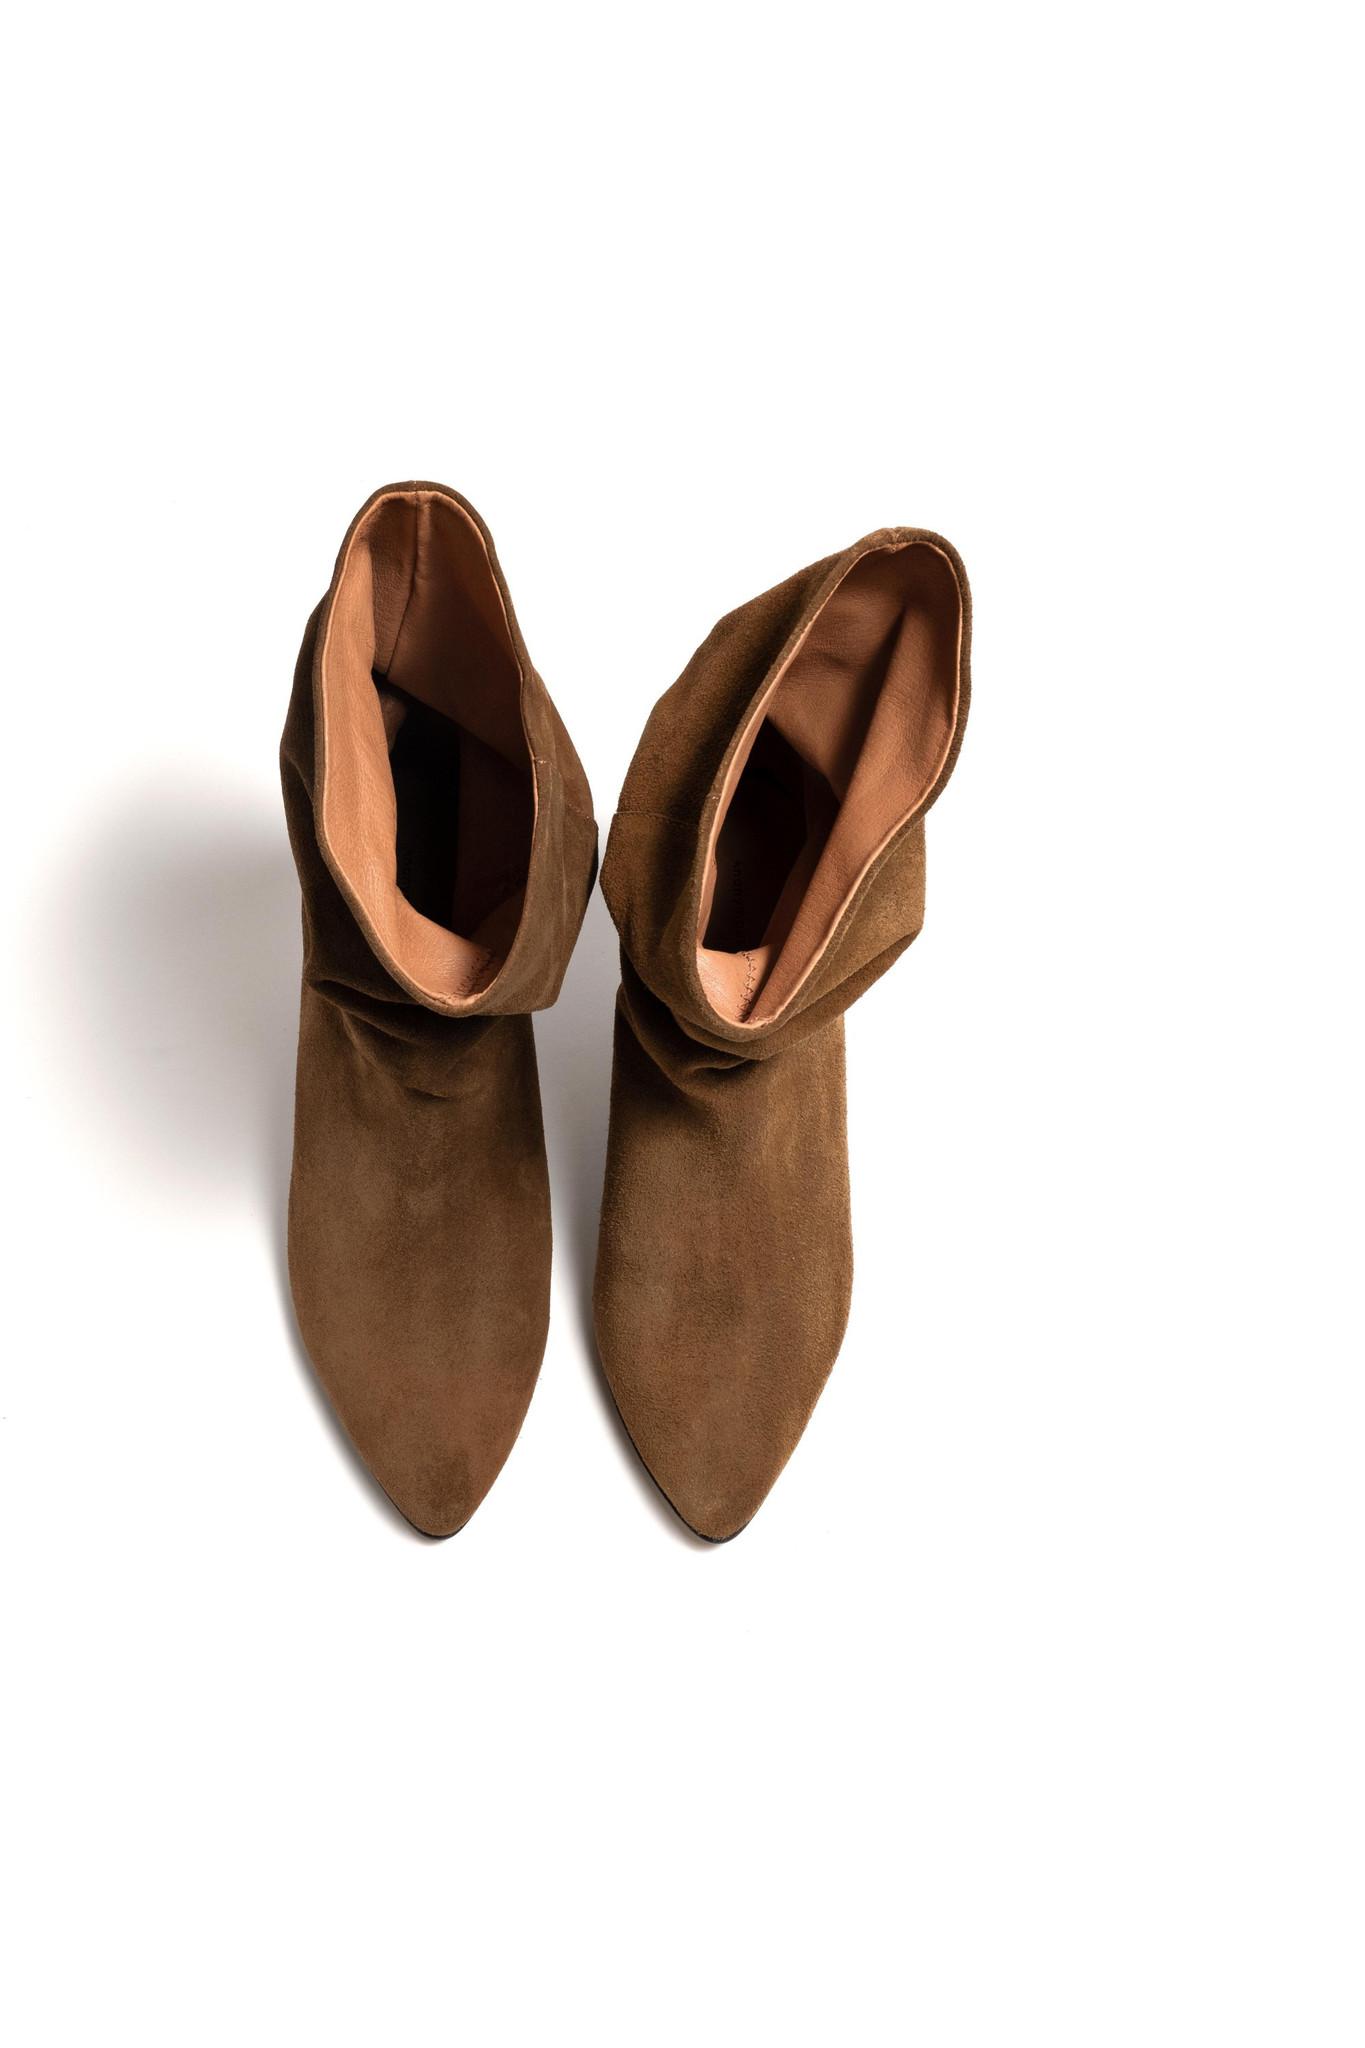 Vully 50 Triangle Calf Suede Boot - Cinnamon-4